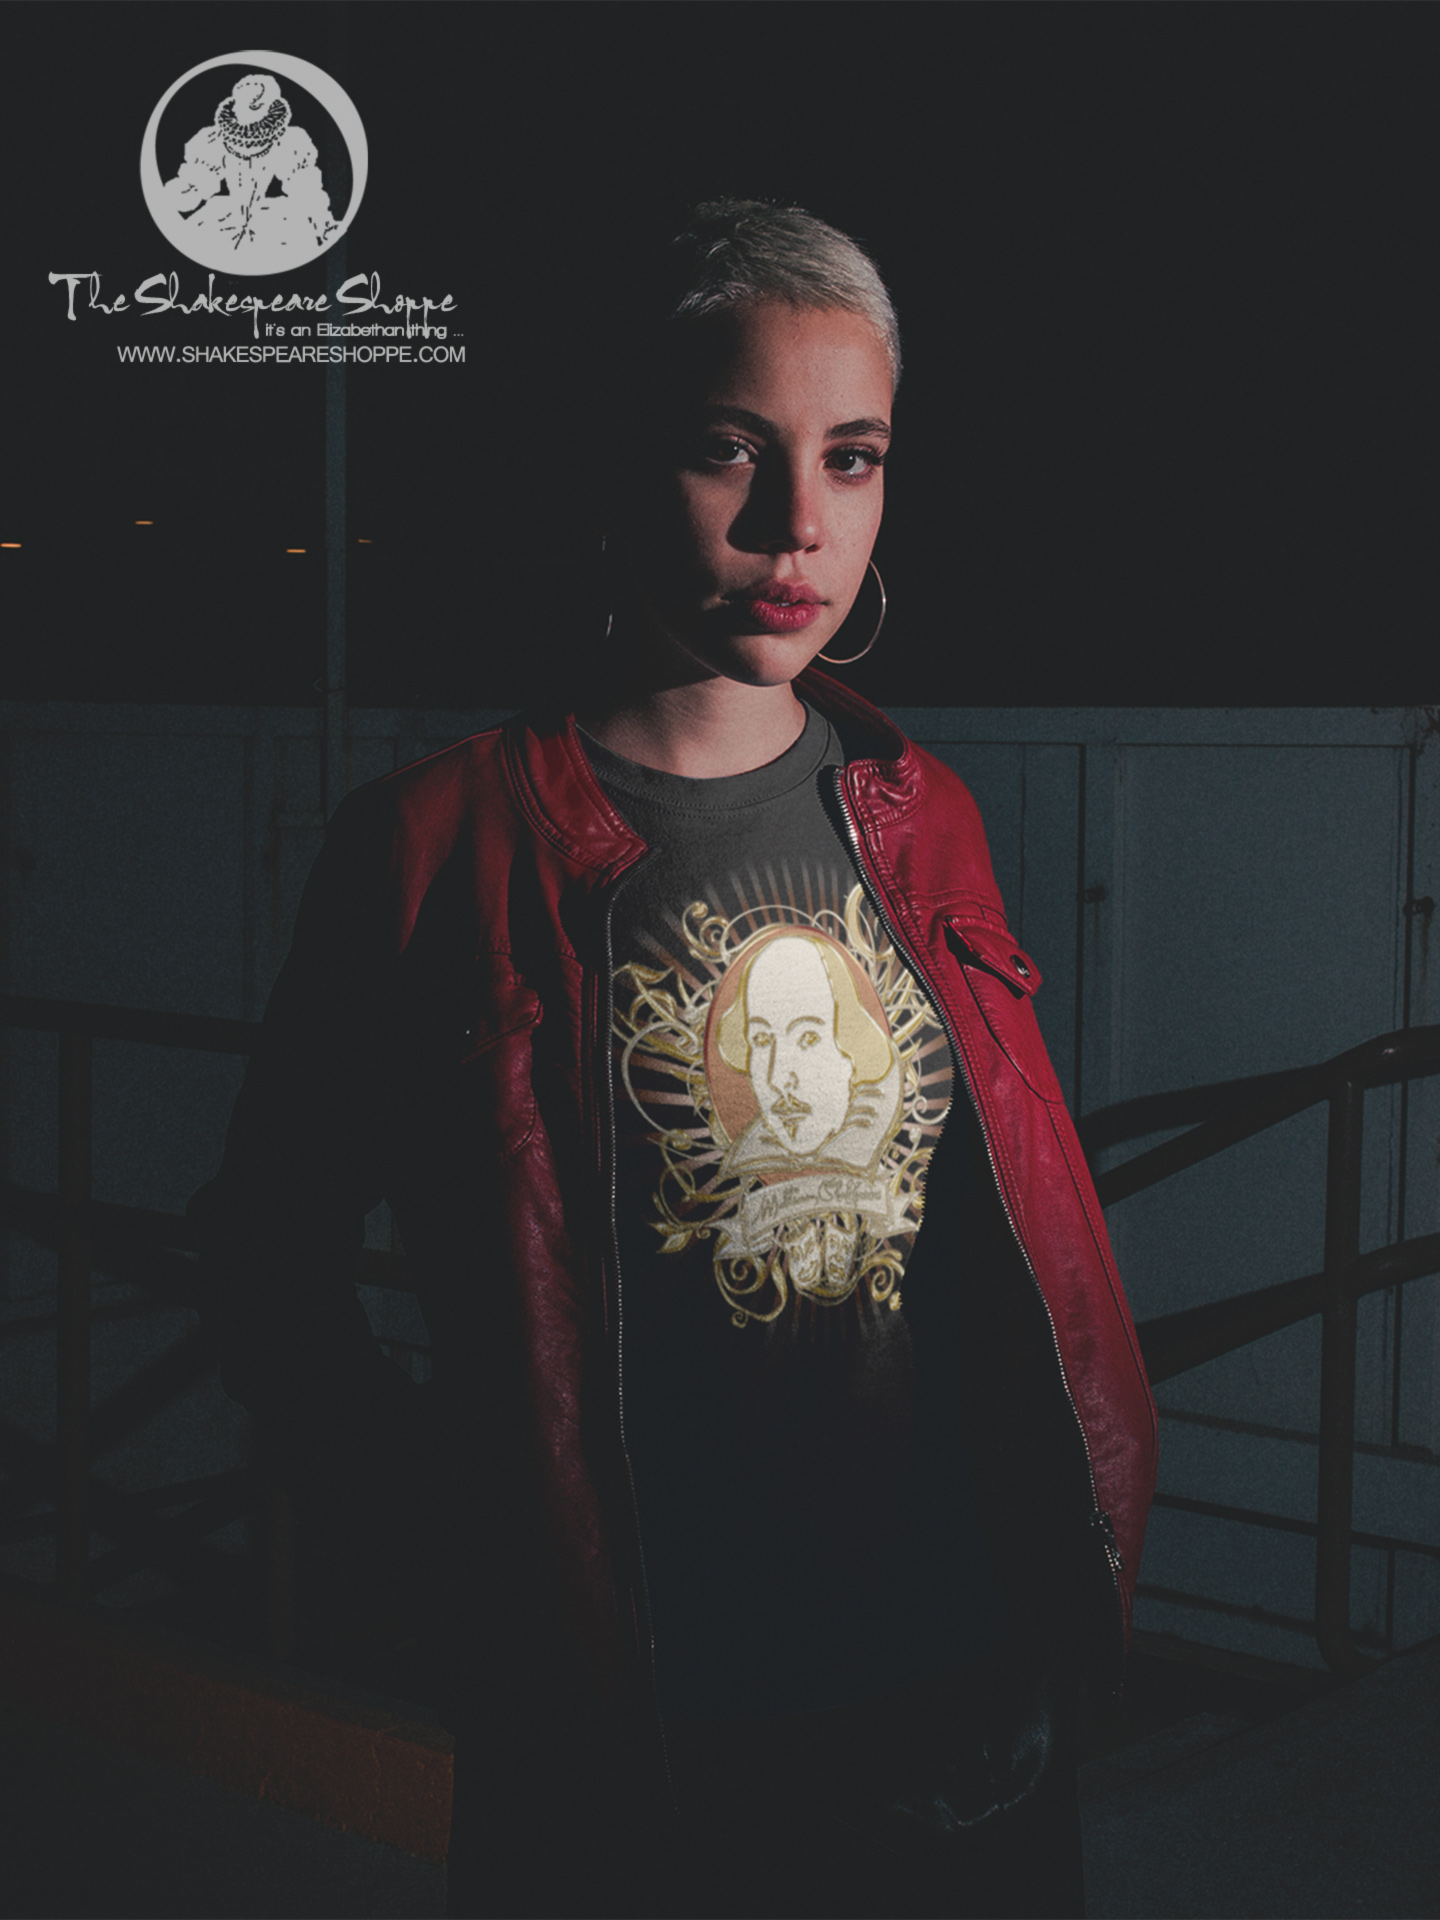 Focus On: Shakespeare Gold Portrait Unisex T-Shirt #Shakespeare #tshirt